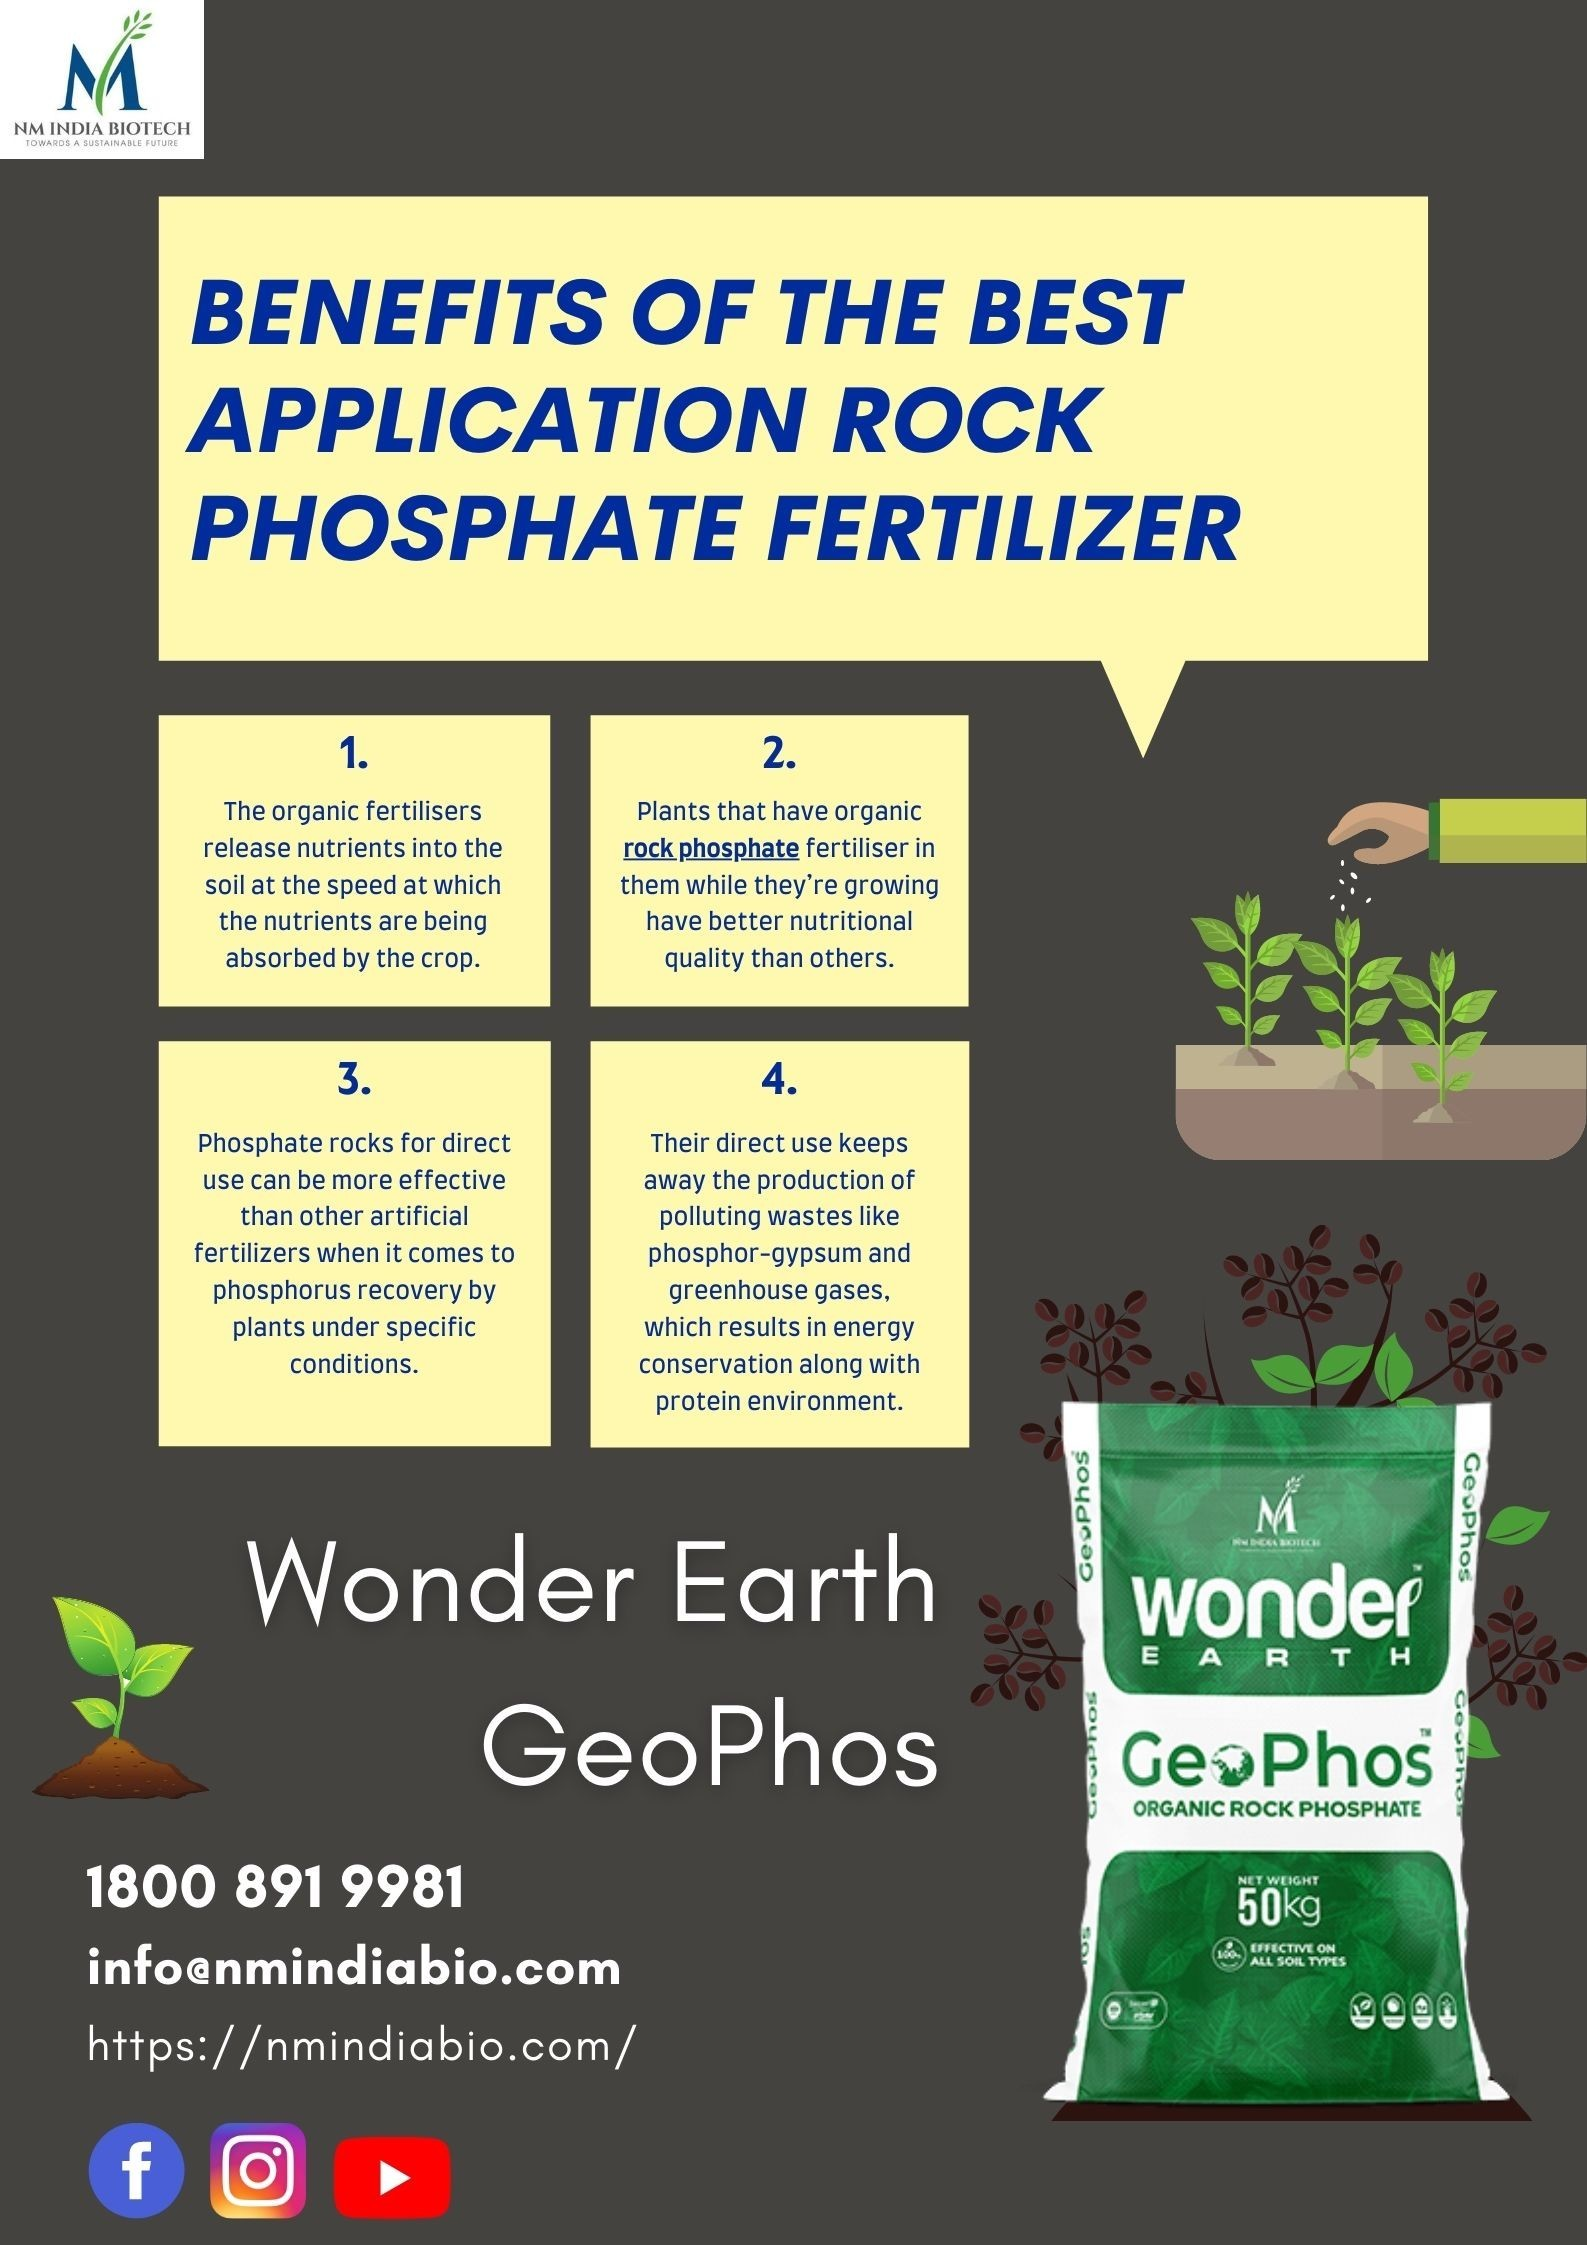 Top 4 Benefits of Rock Phosphate Fertilizer | NM India Biotech